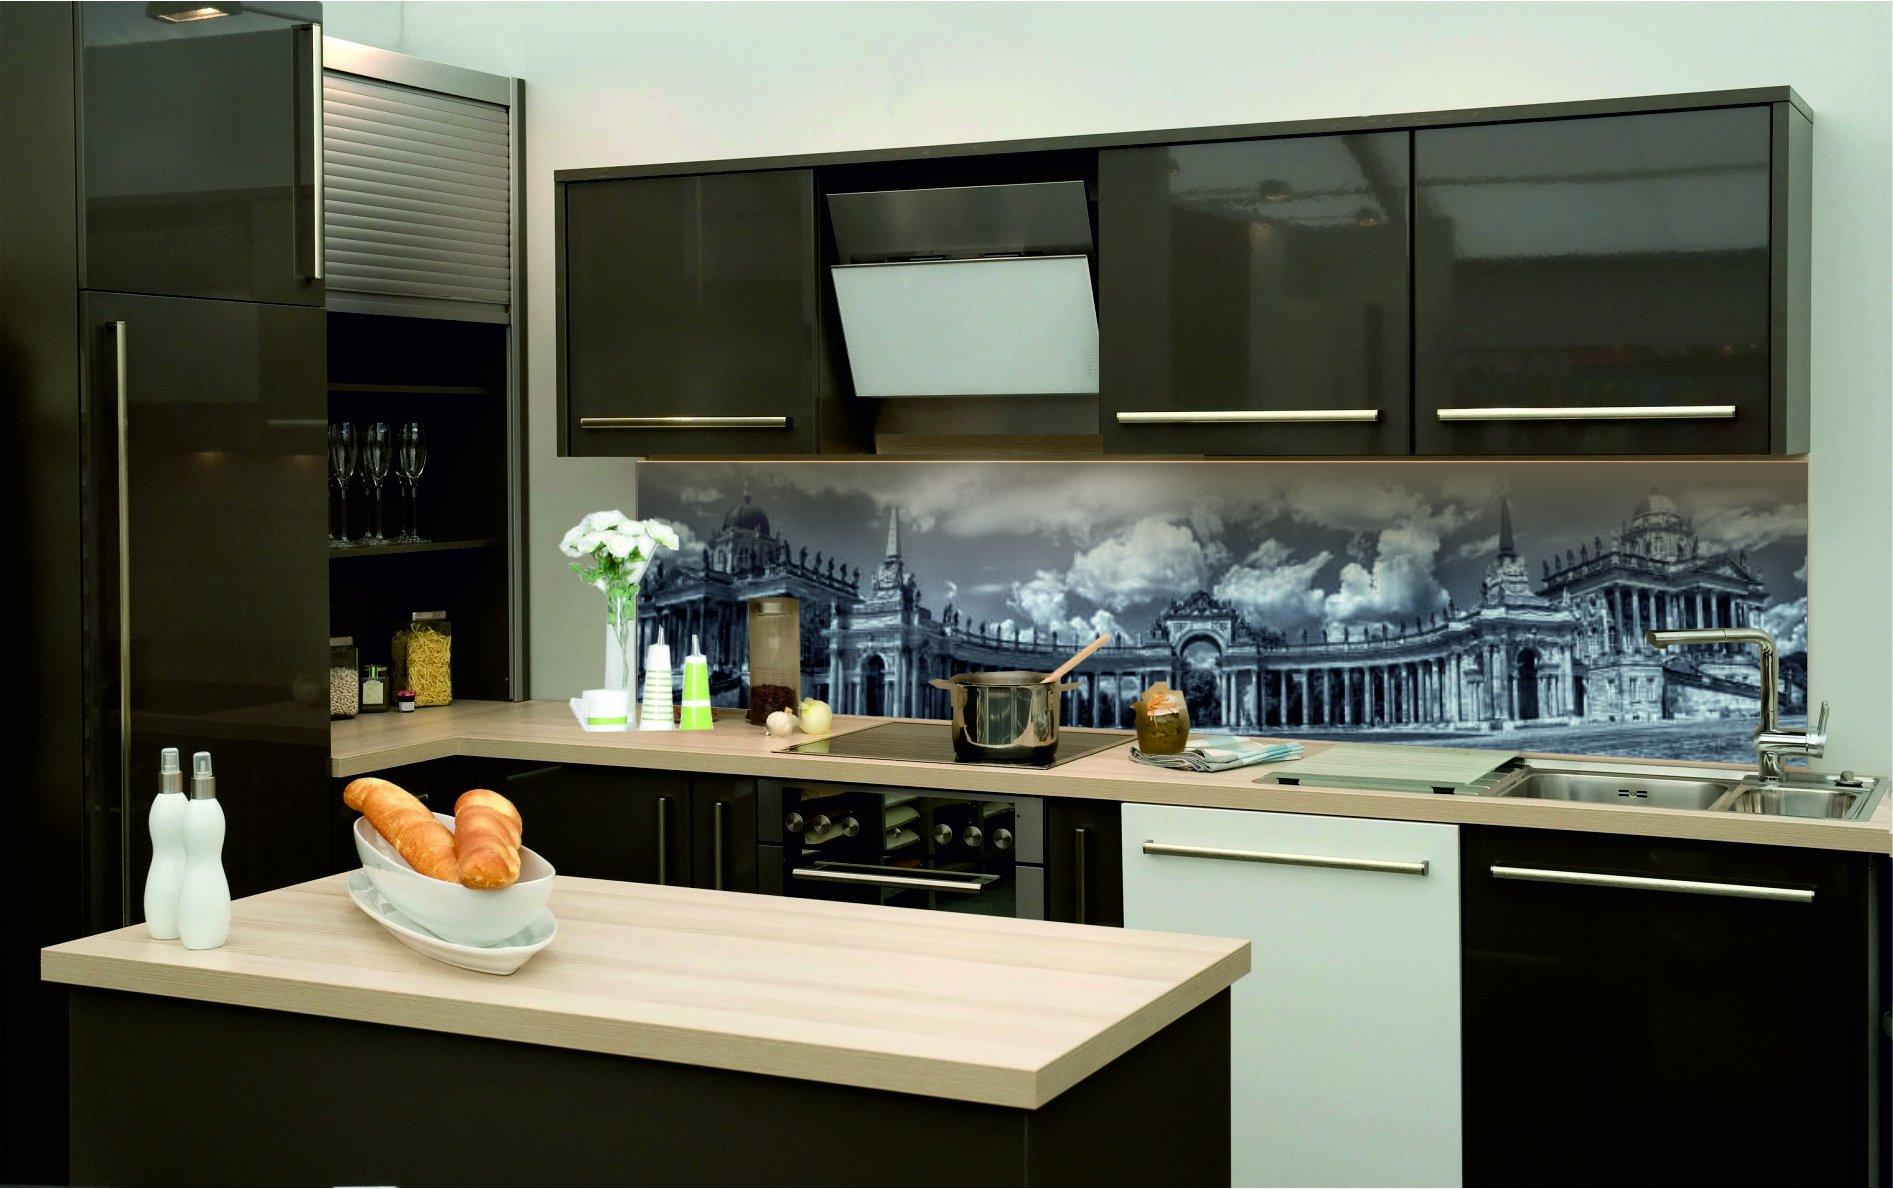 k chenr ckwand hart pvc selbstklebend schwarz weiss monumental kfs71 ebay. Black Bedroom Furniture Sets. Home Design Ideas